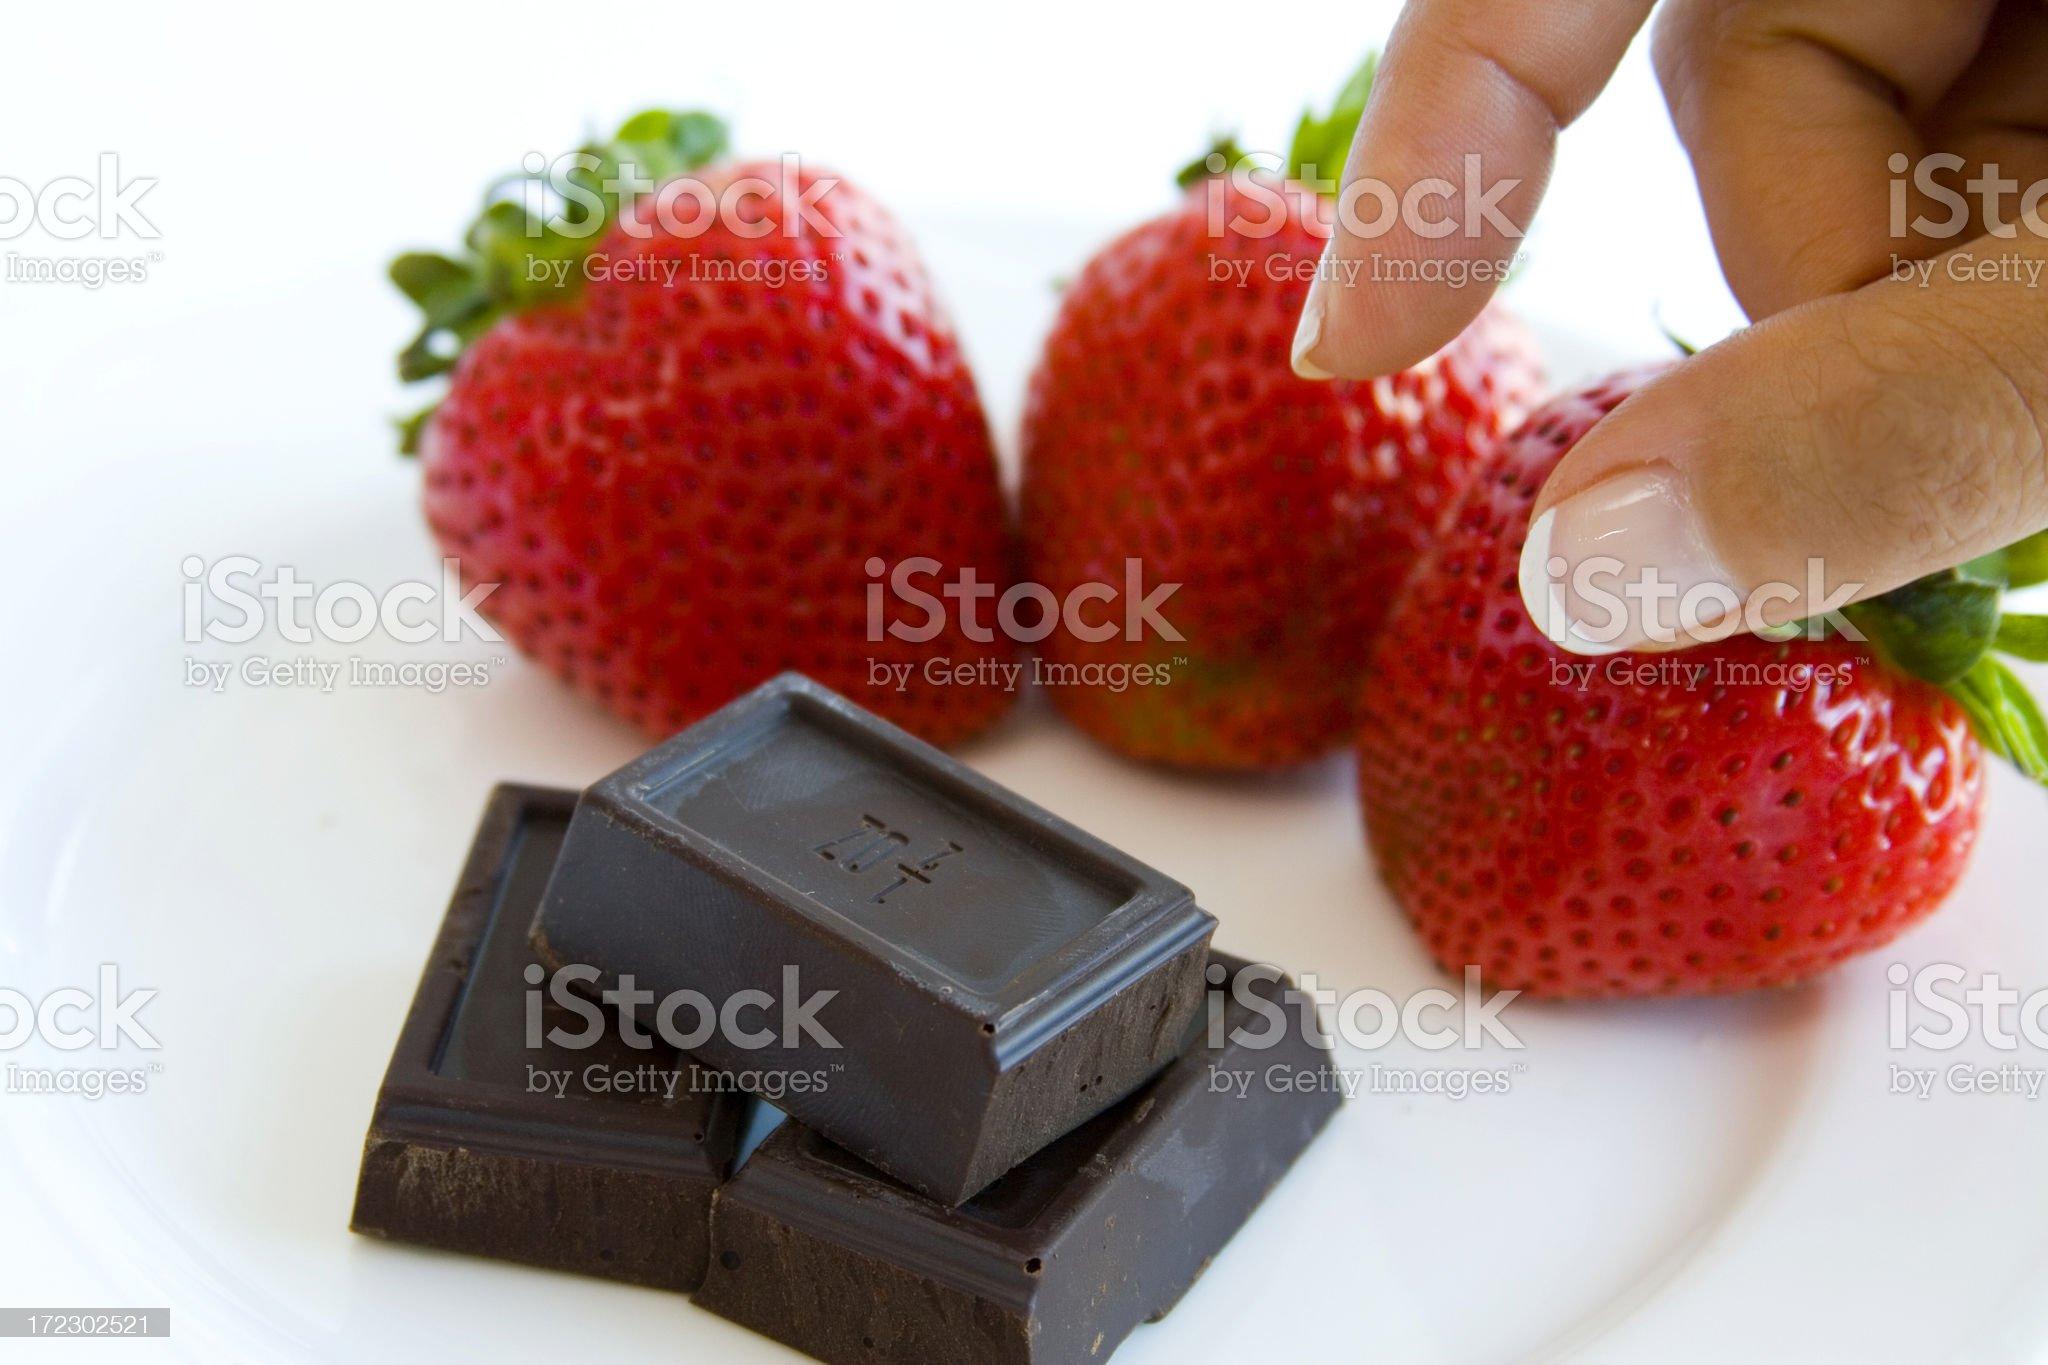 Chocolate temptation royalty-free stock photo